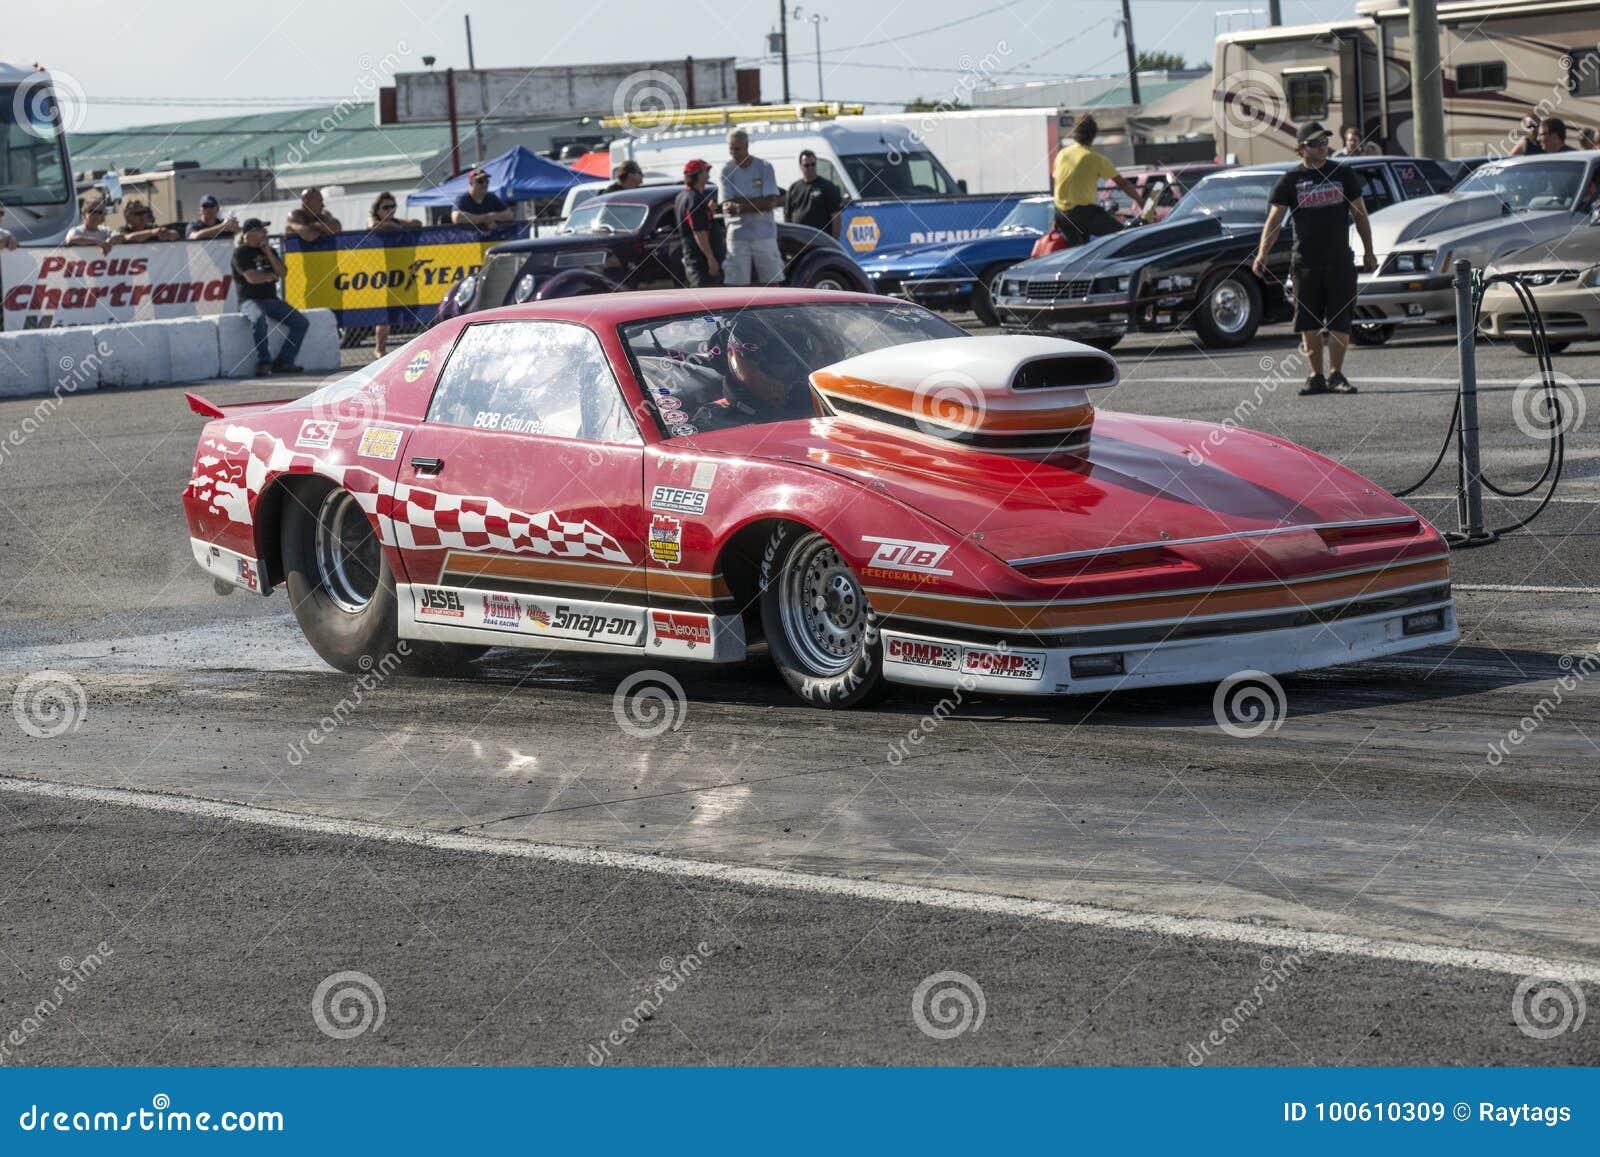 Pontiac firebird drag car editorial stock image. Image of generation ...